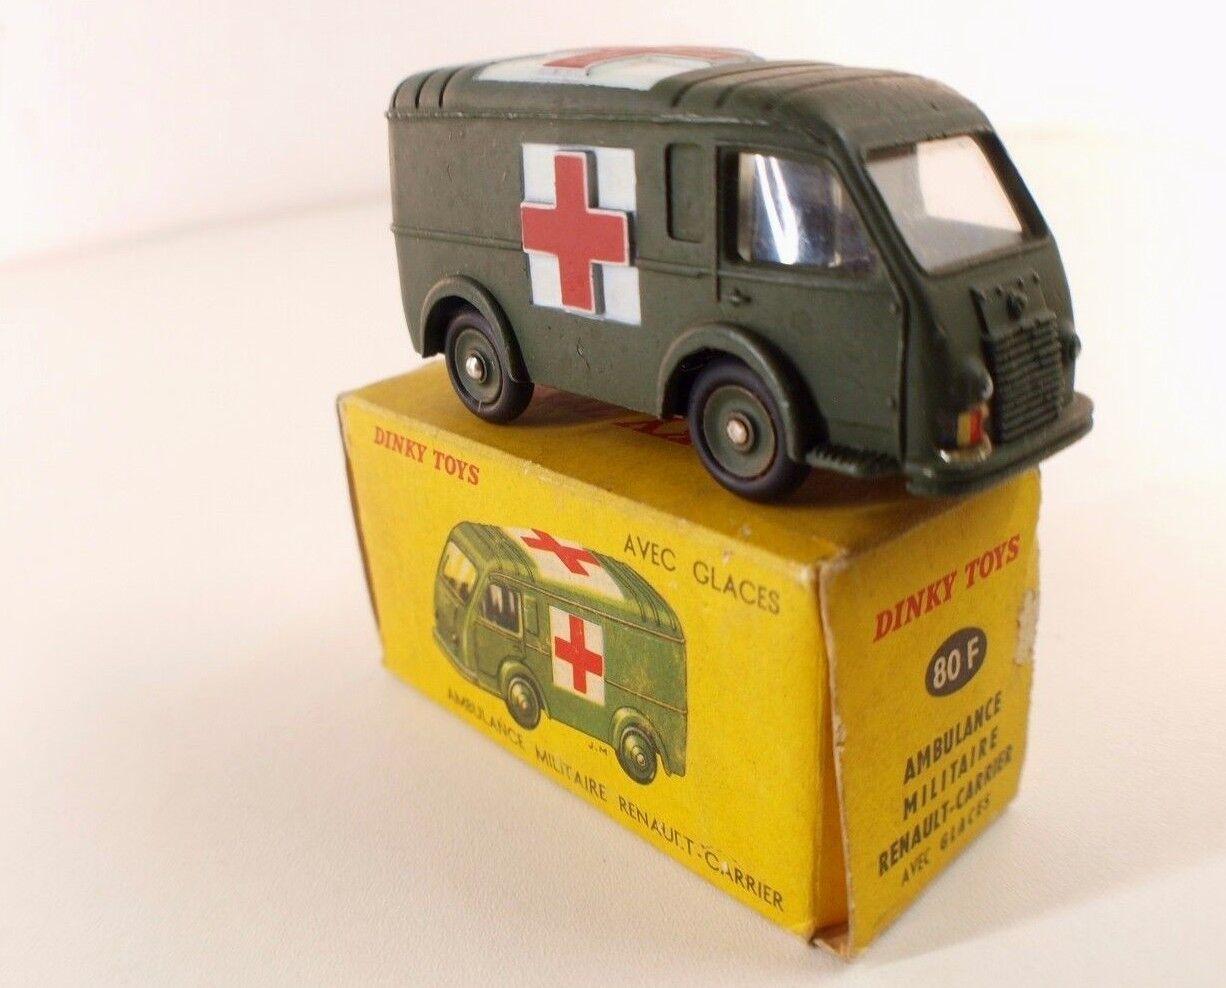 Dinky Toys F 80F Ambulance Renault Carrier militaire en boîte